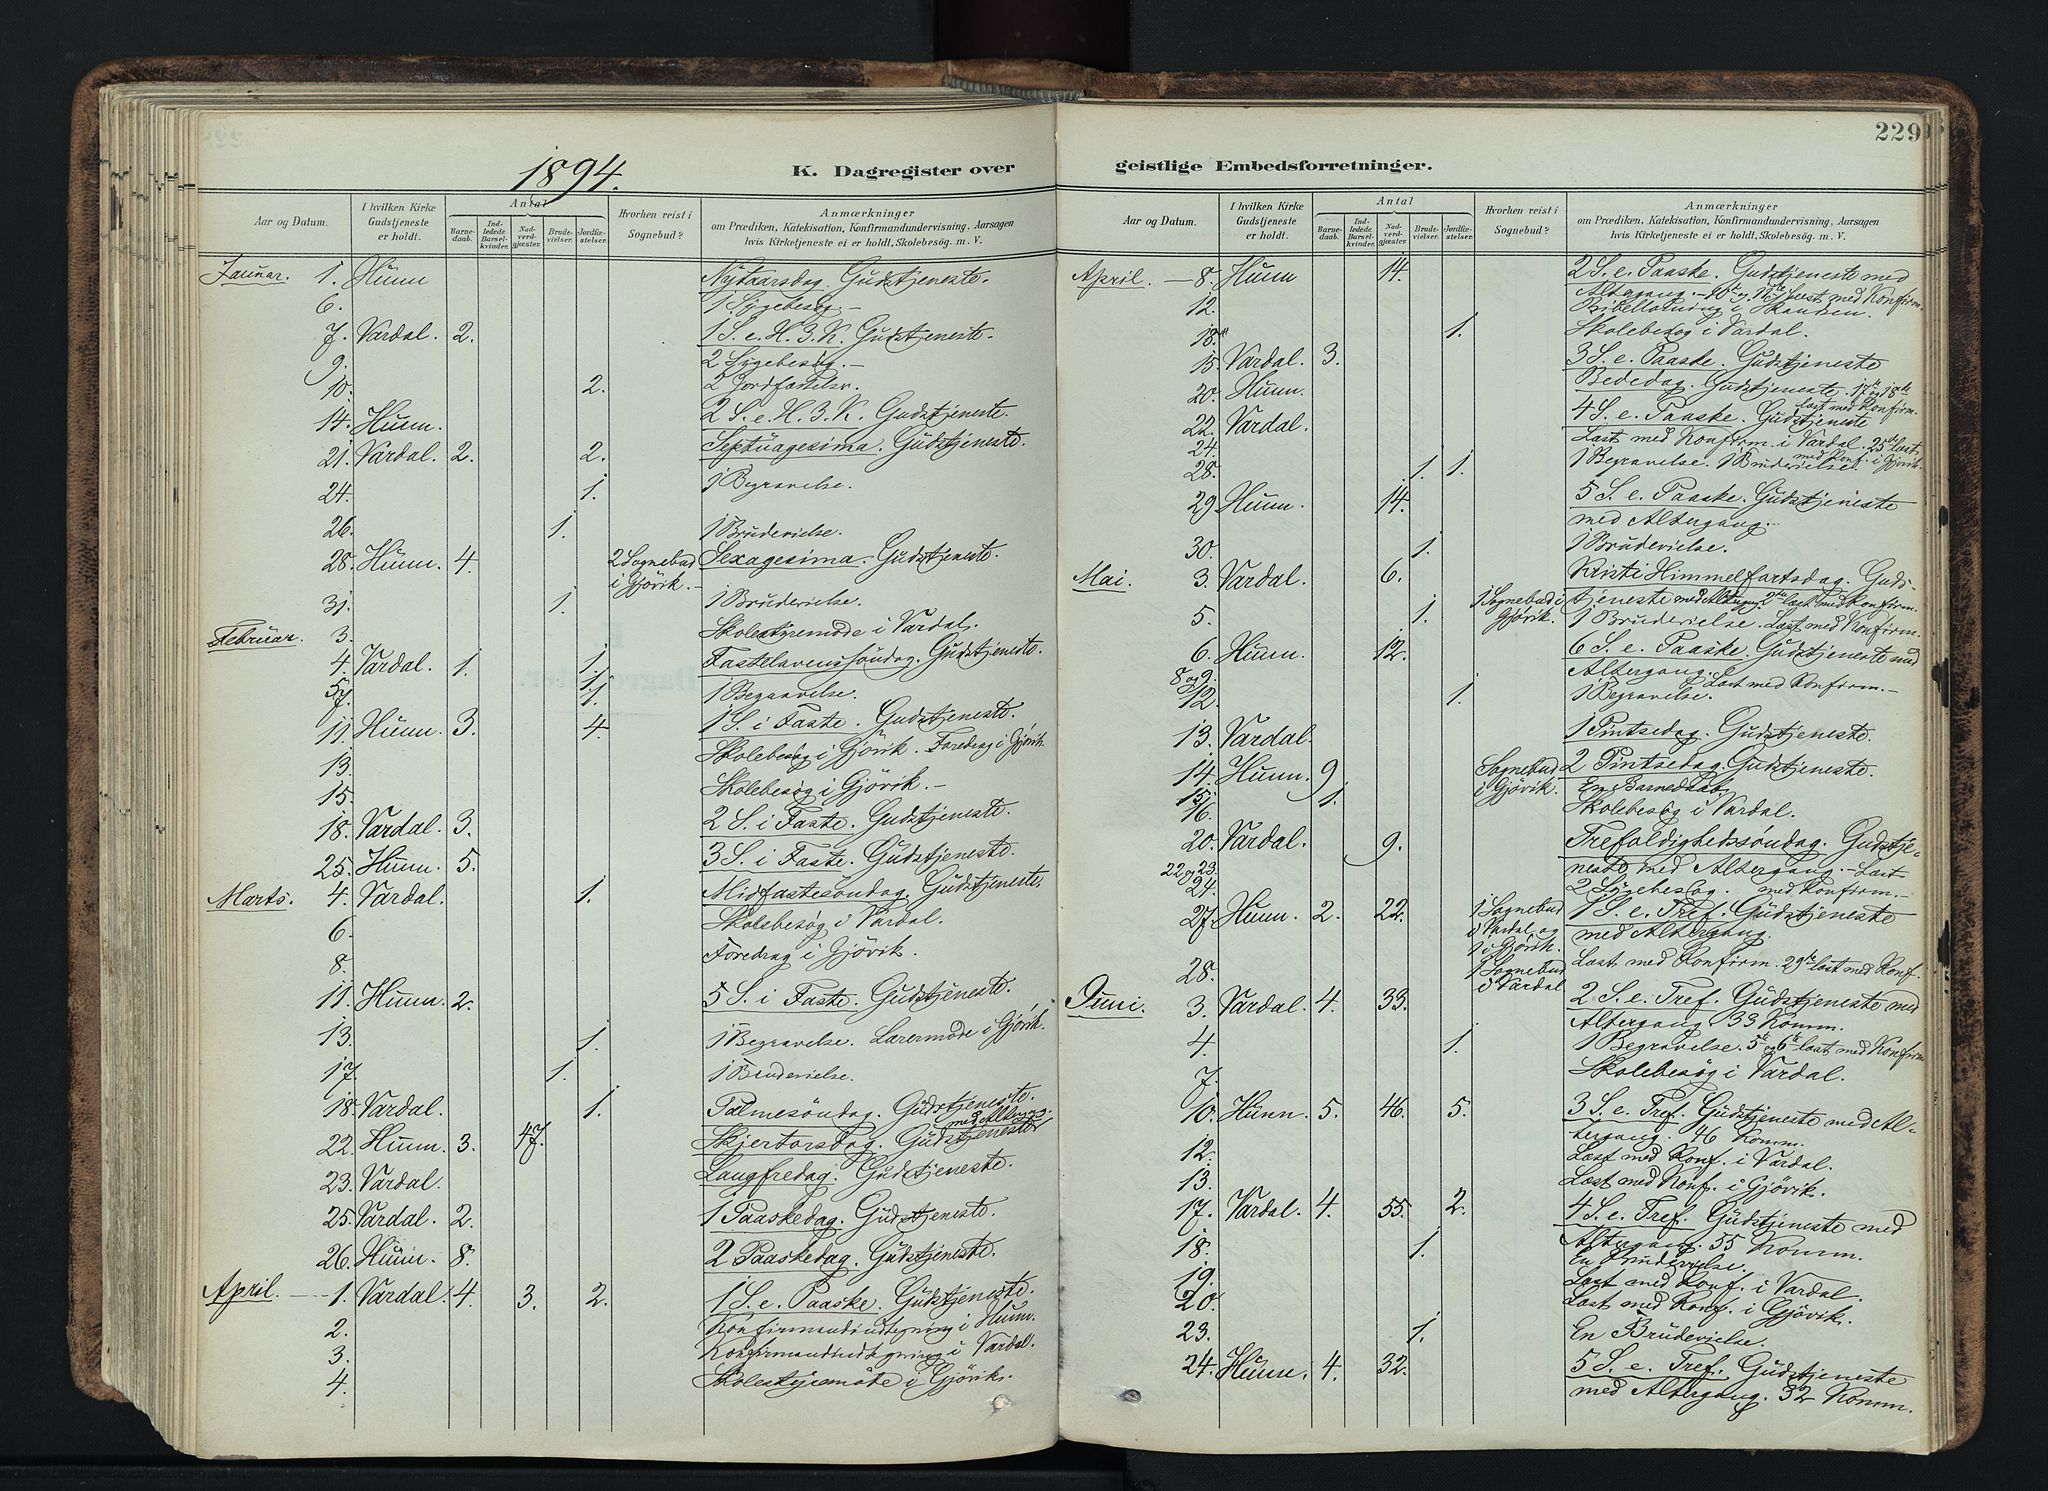 SAH, Vardal prestekontor, H/Ha/Haa/L0019: Ministerialbok nr. 19, 1893-1907, s. 229